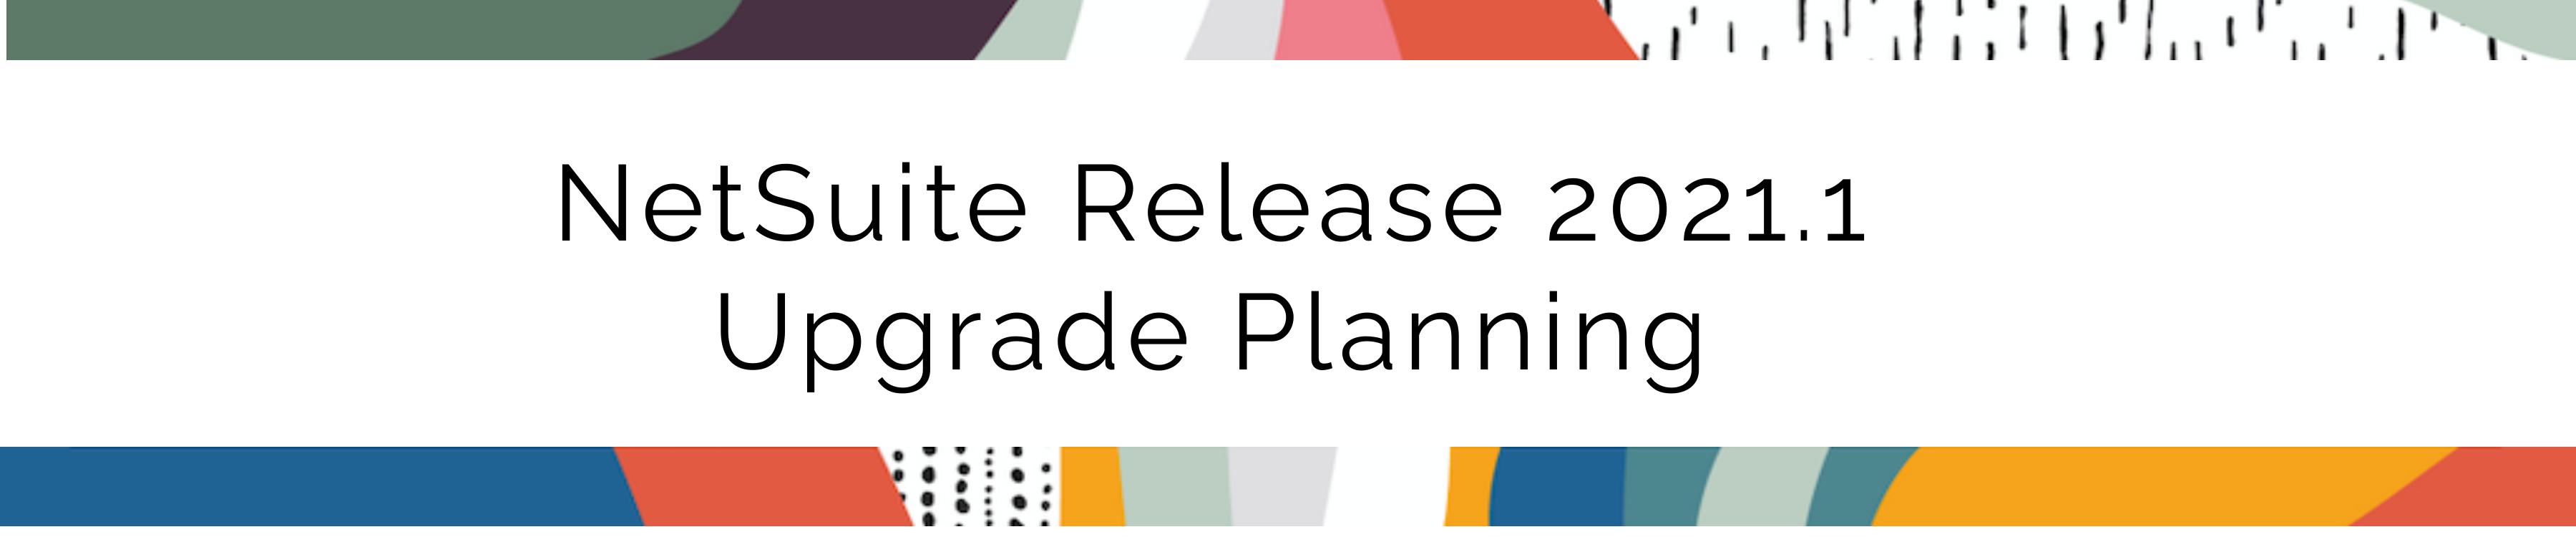 2021.1 Upgrade Plannin